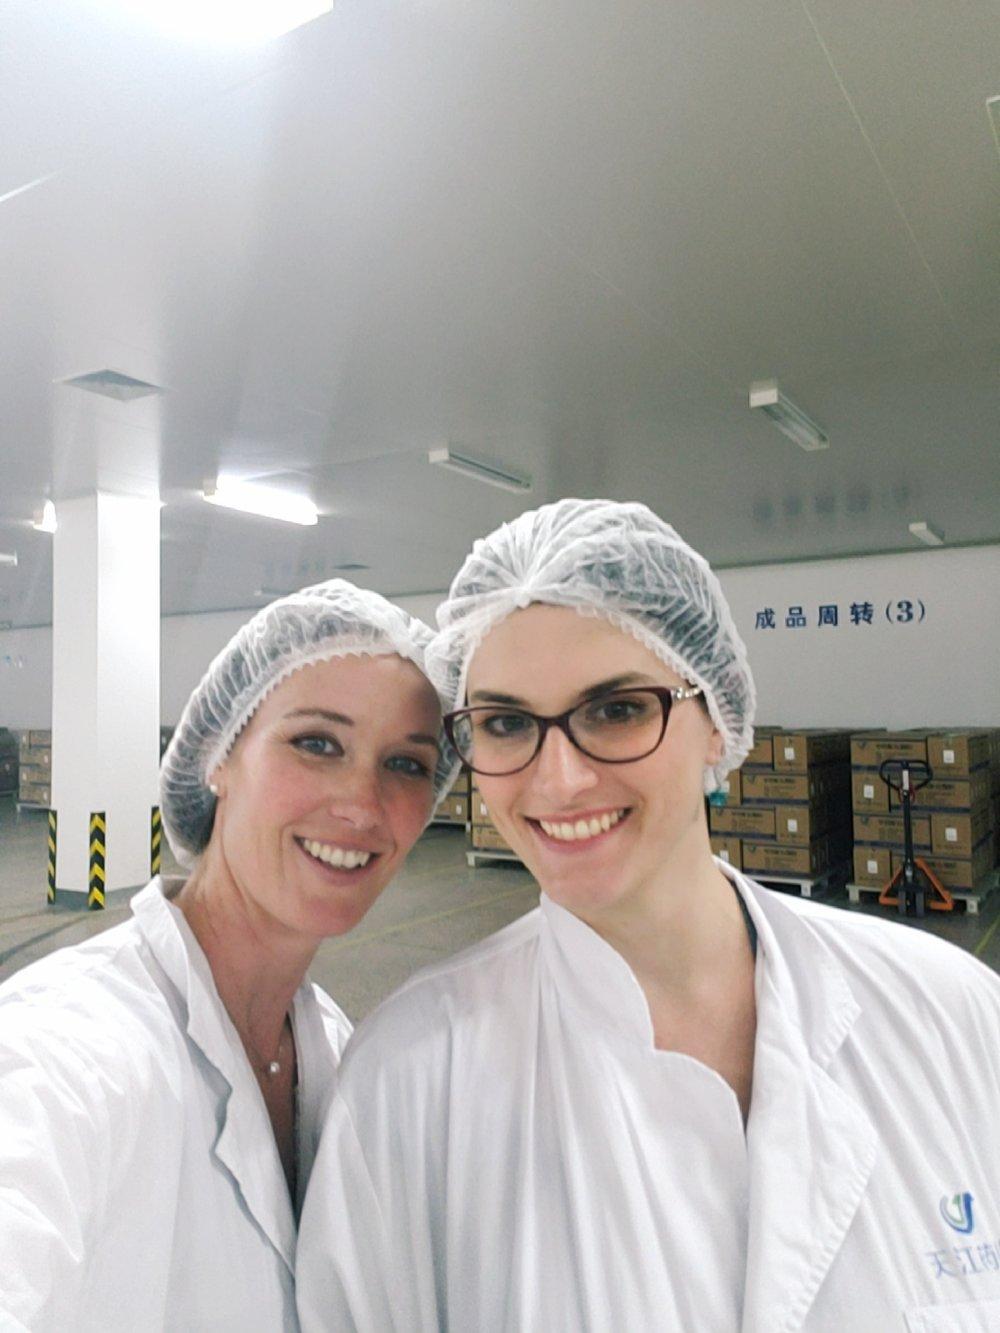 Angela and Bruna at the hospital in China